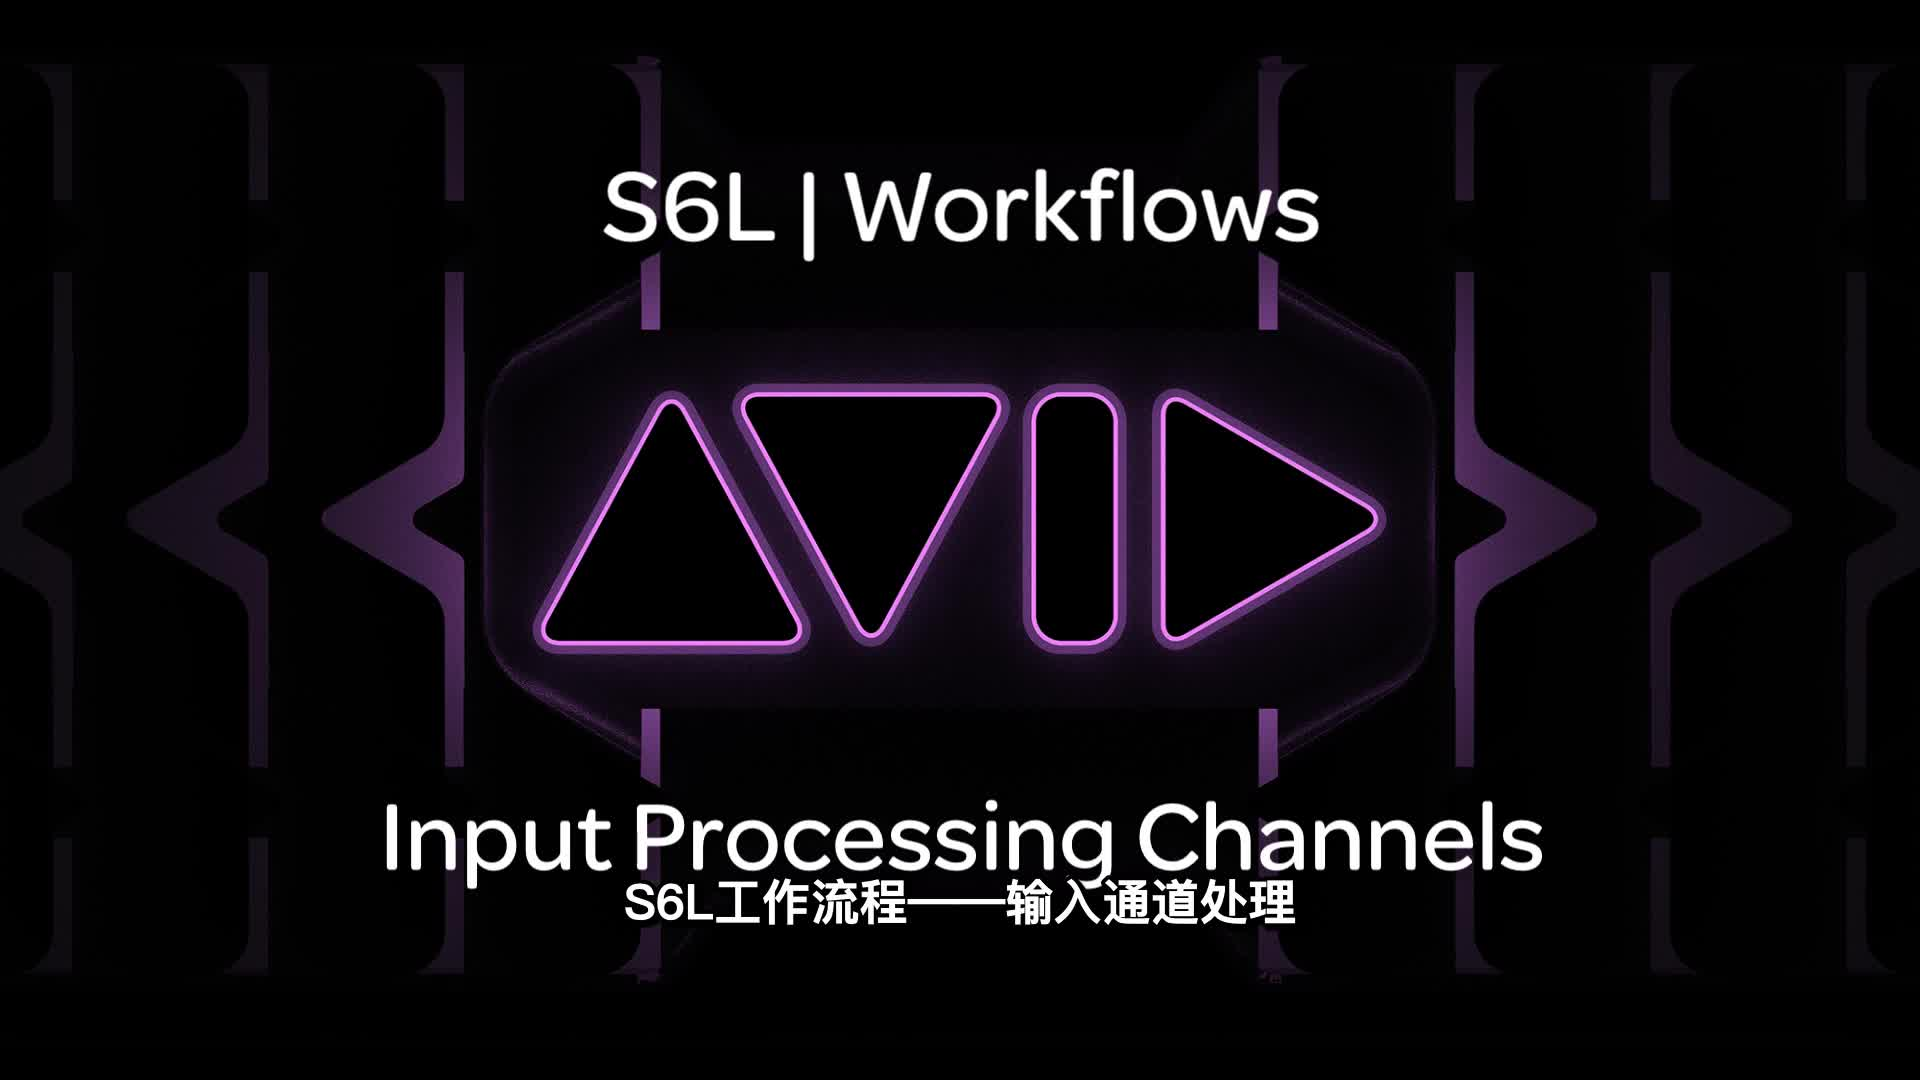 02 VENUE  S6L|Workflows Input Processing Channels